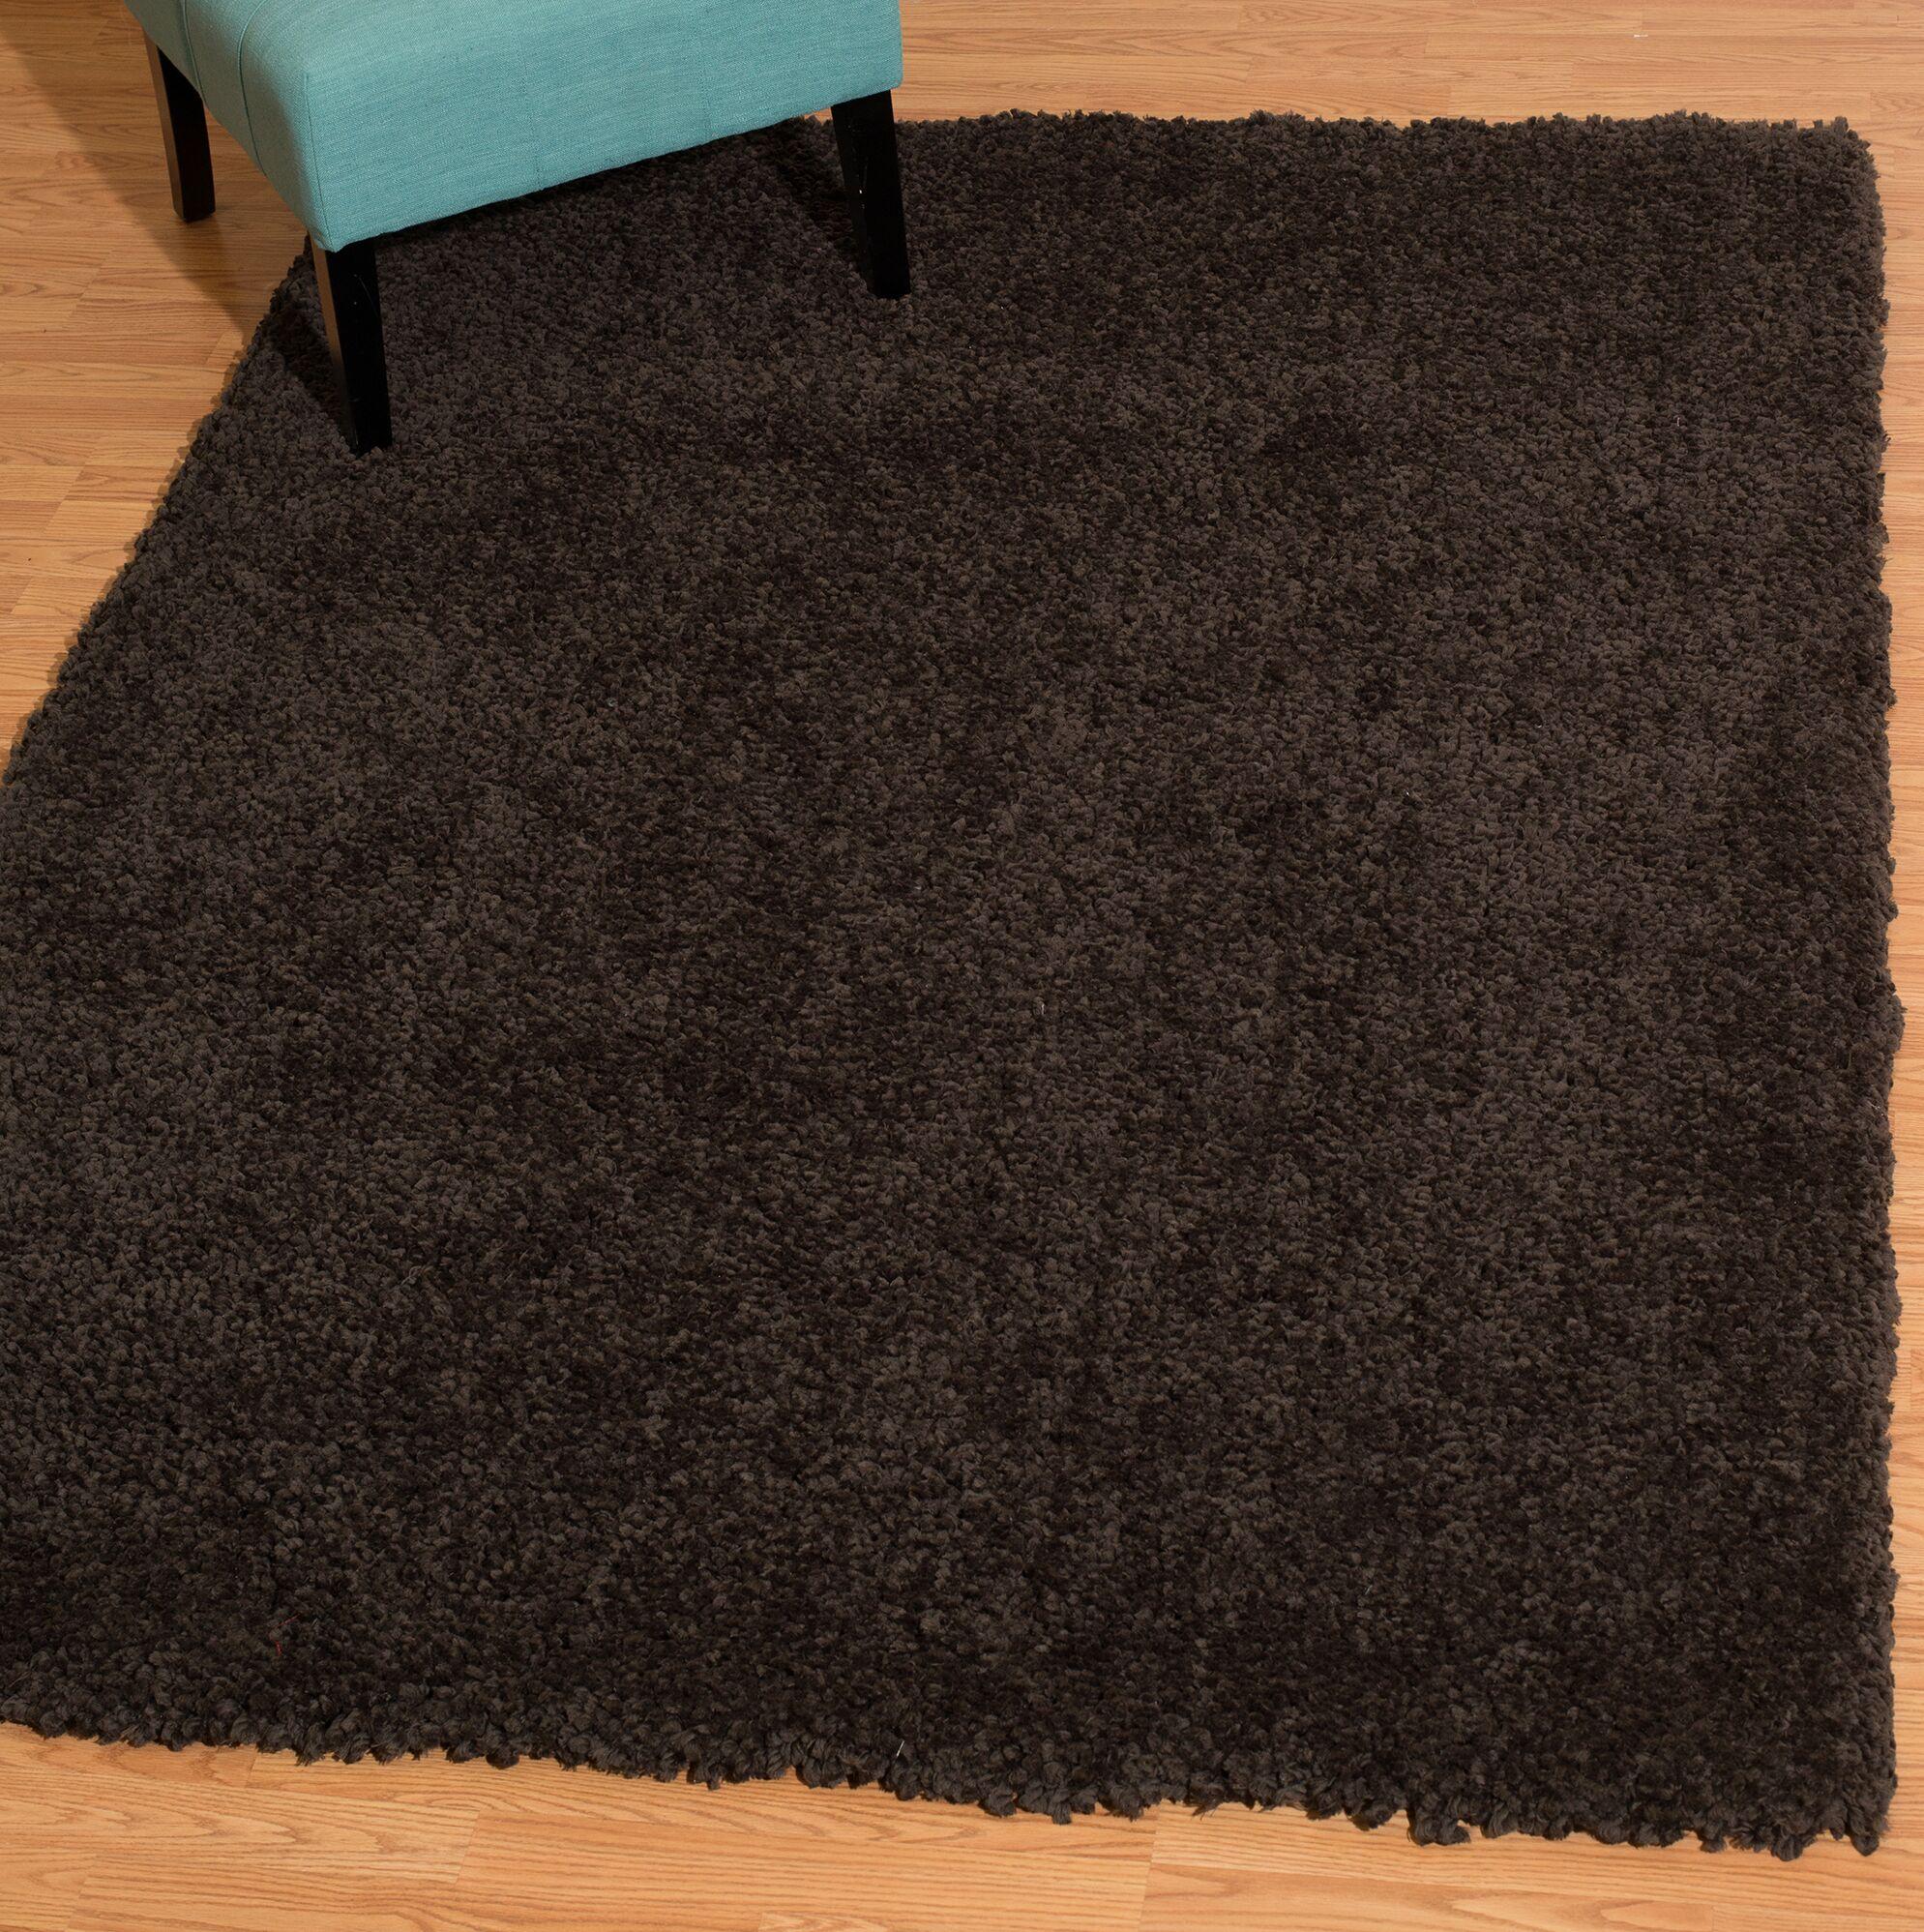 Mullenix Dark Chocolate Area Rug Rug Size: Rectangle 5'3